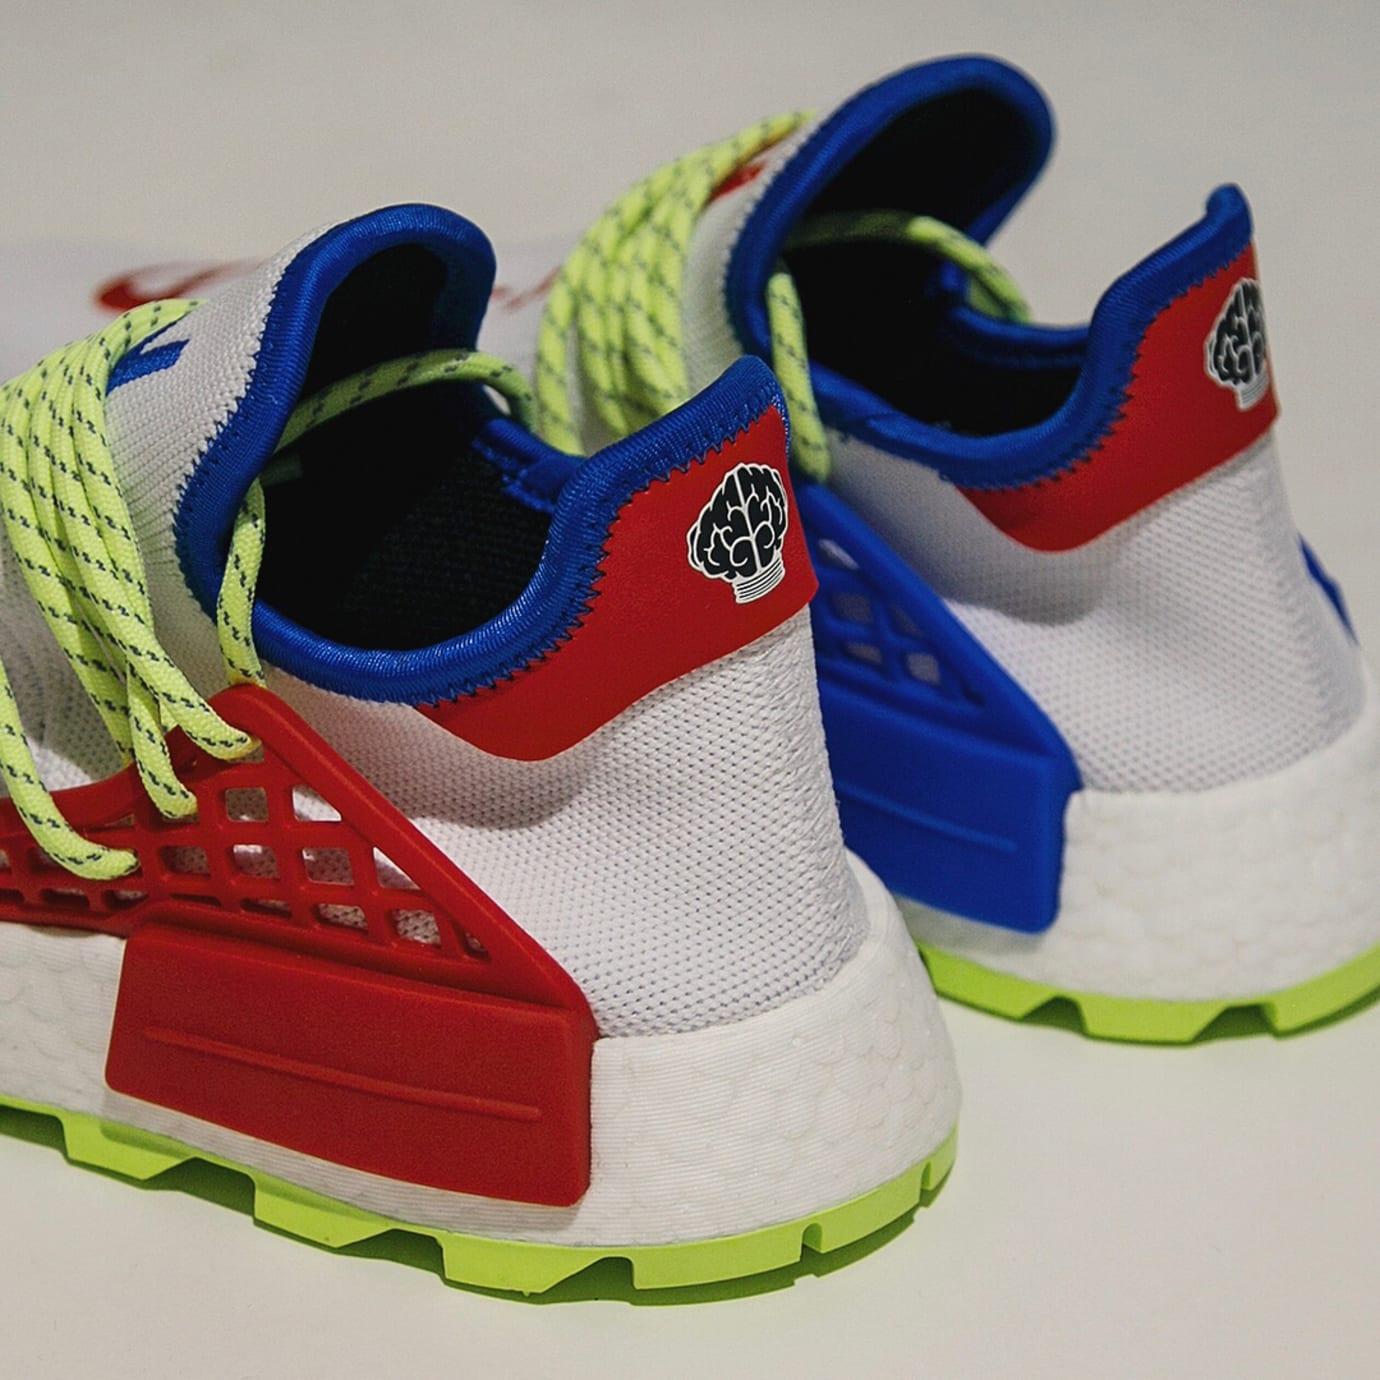 best website 90794 37fdb Pharrell Williams x Adidas NMD Hu 'N.E.R.D.' Virginia Beach ...